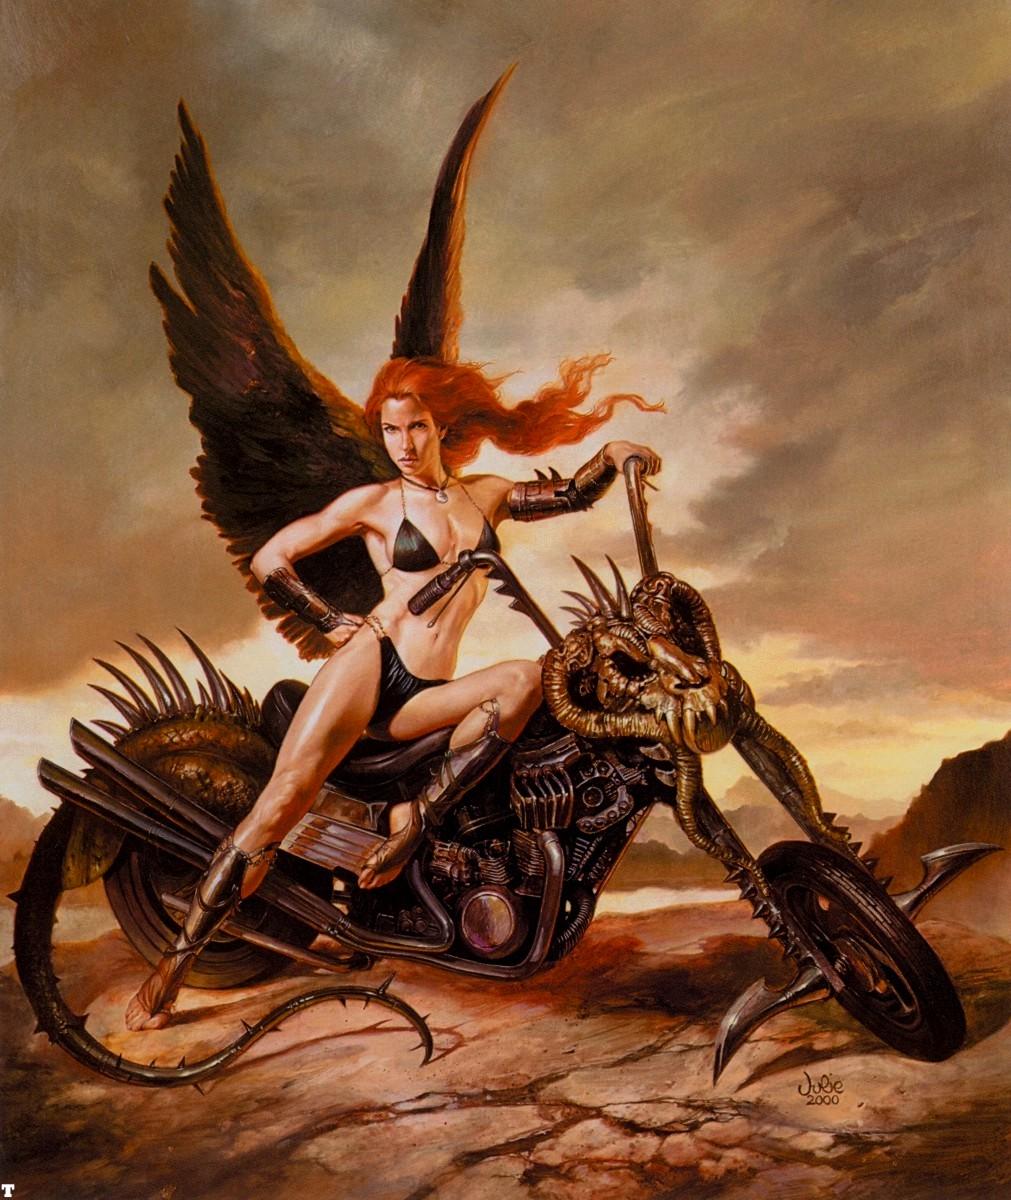 Nude women on motorcycle fantasy art hentai doll